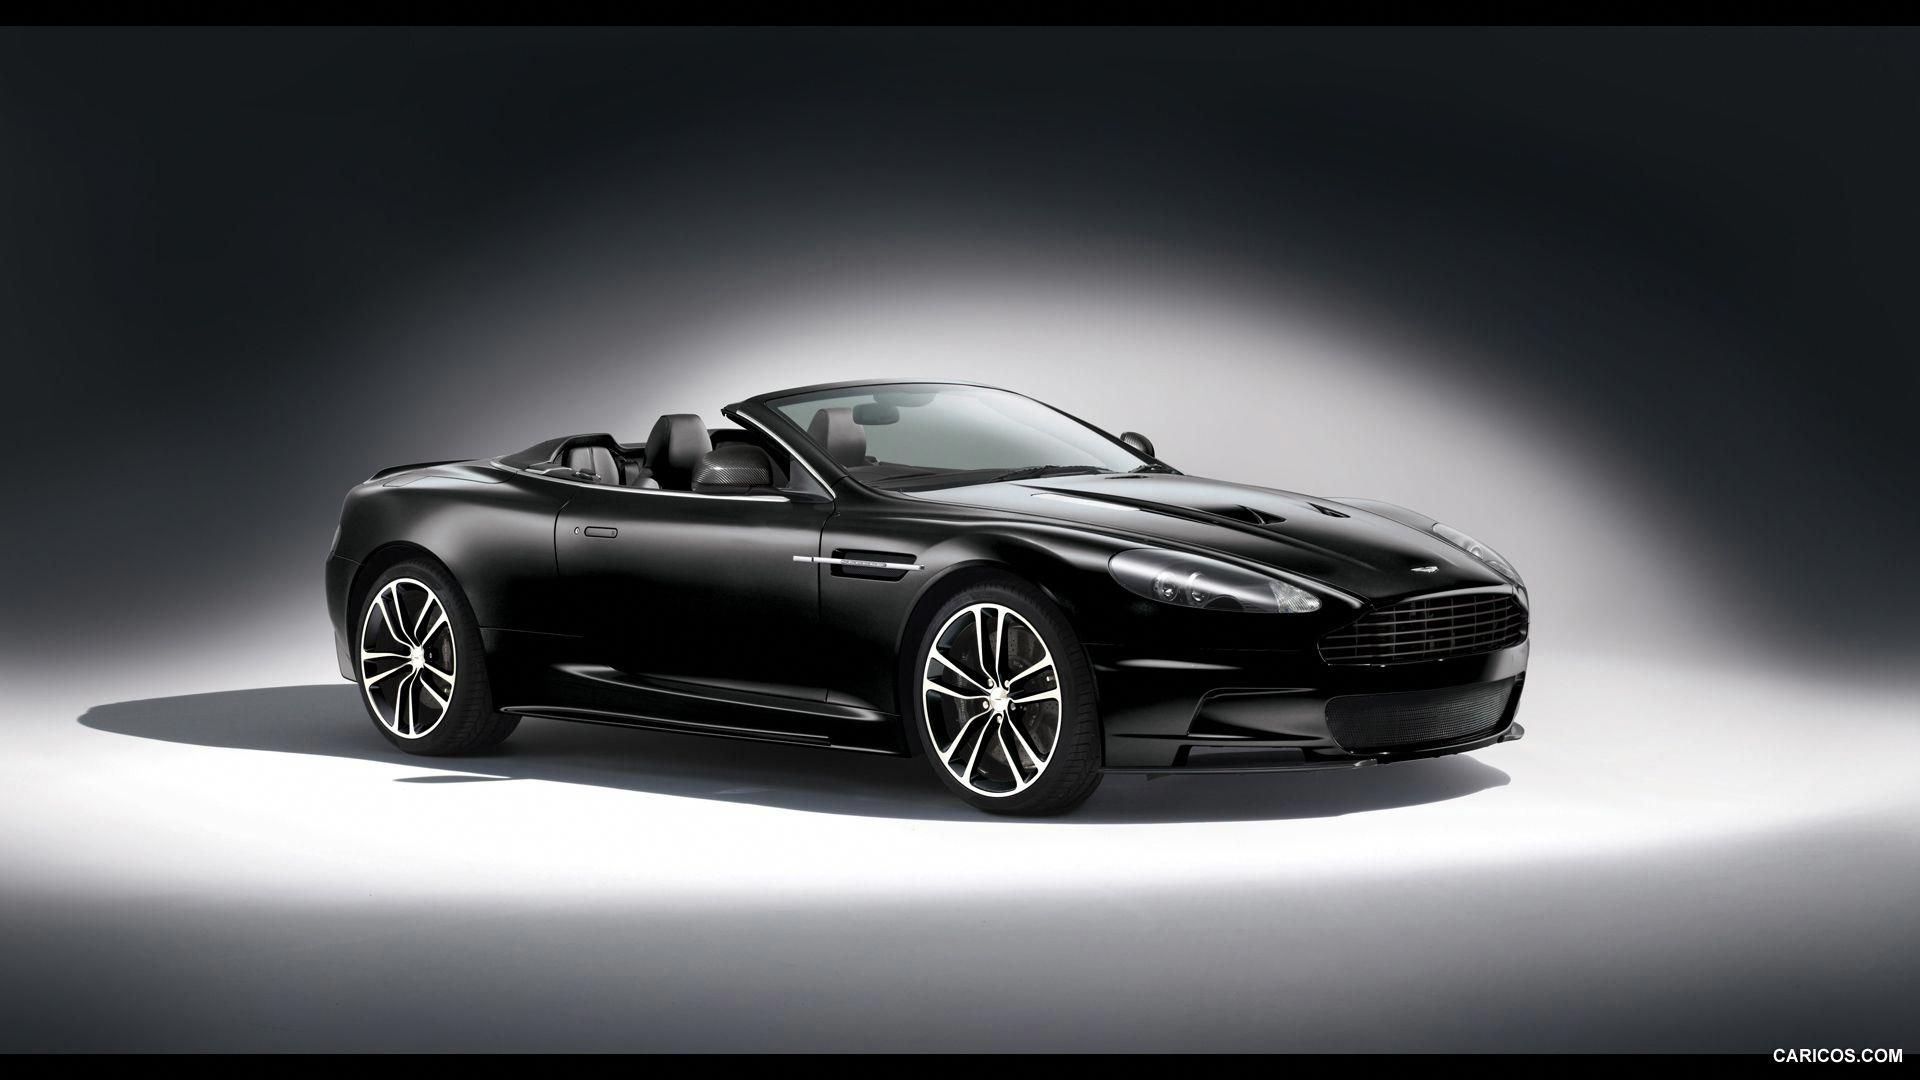 2011 Aston Martin Dbs Carbon Edition Volante Black Front